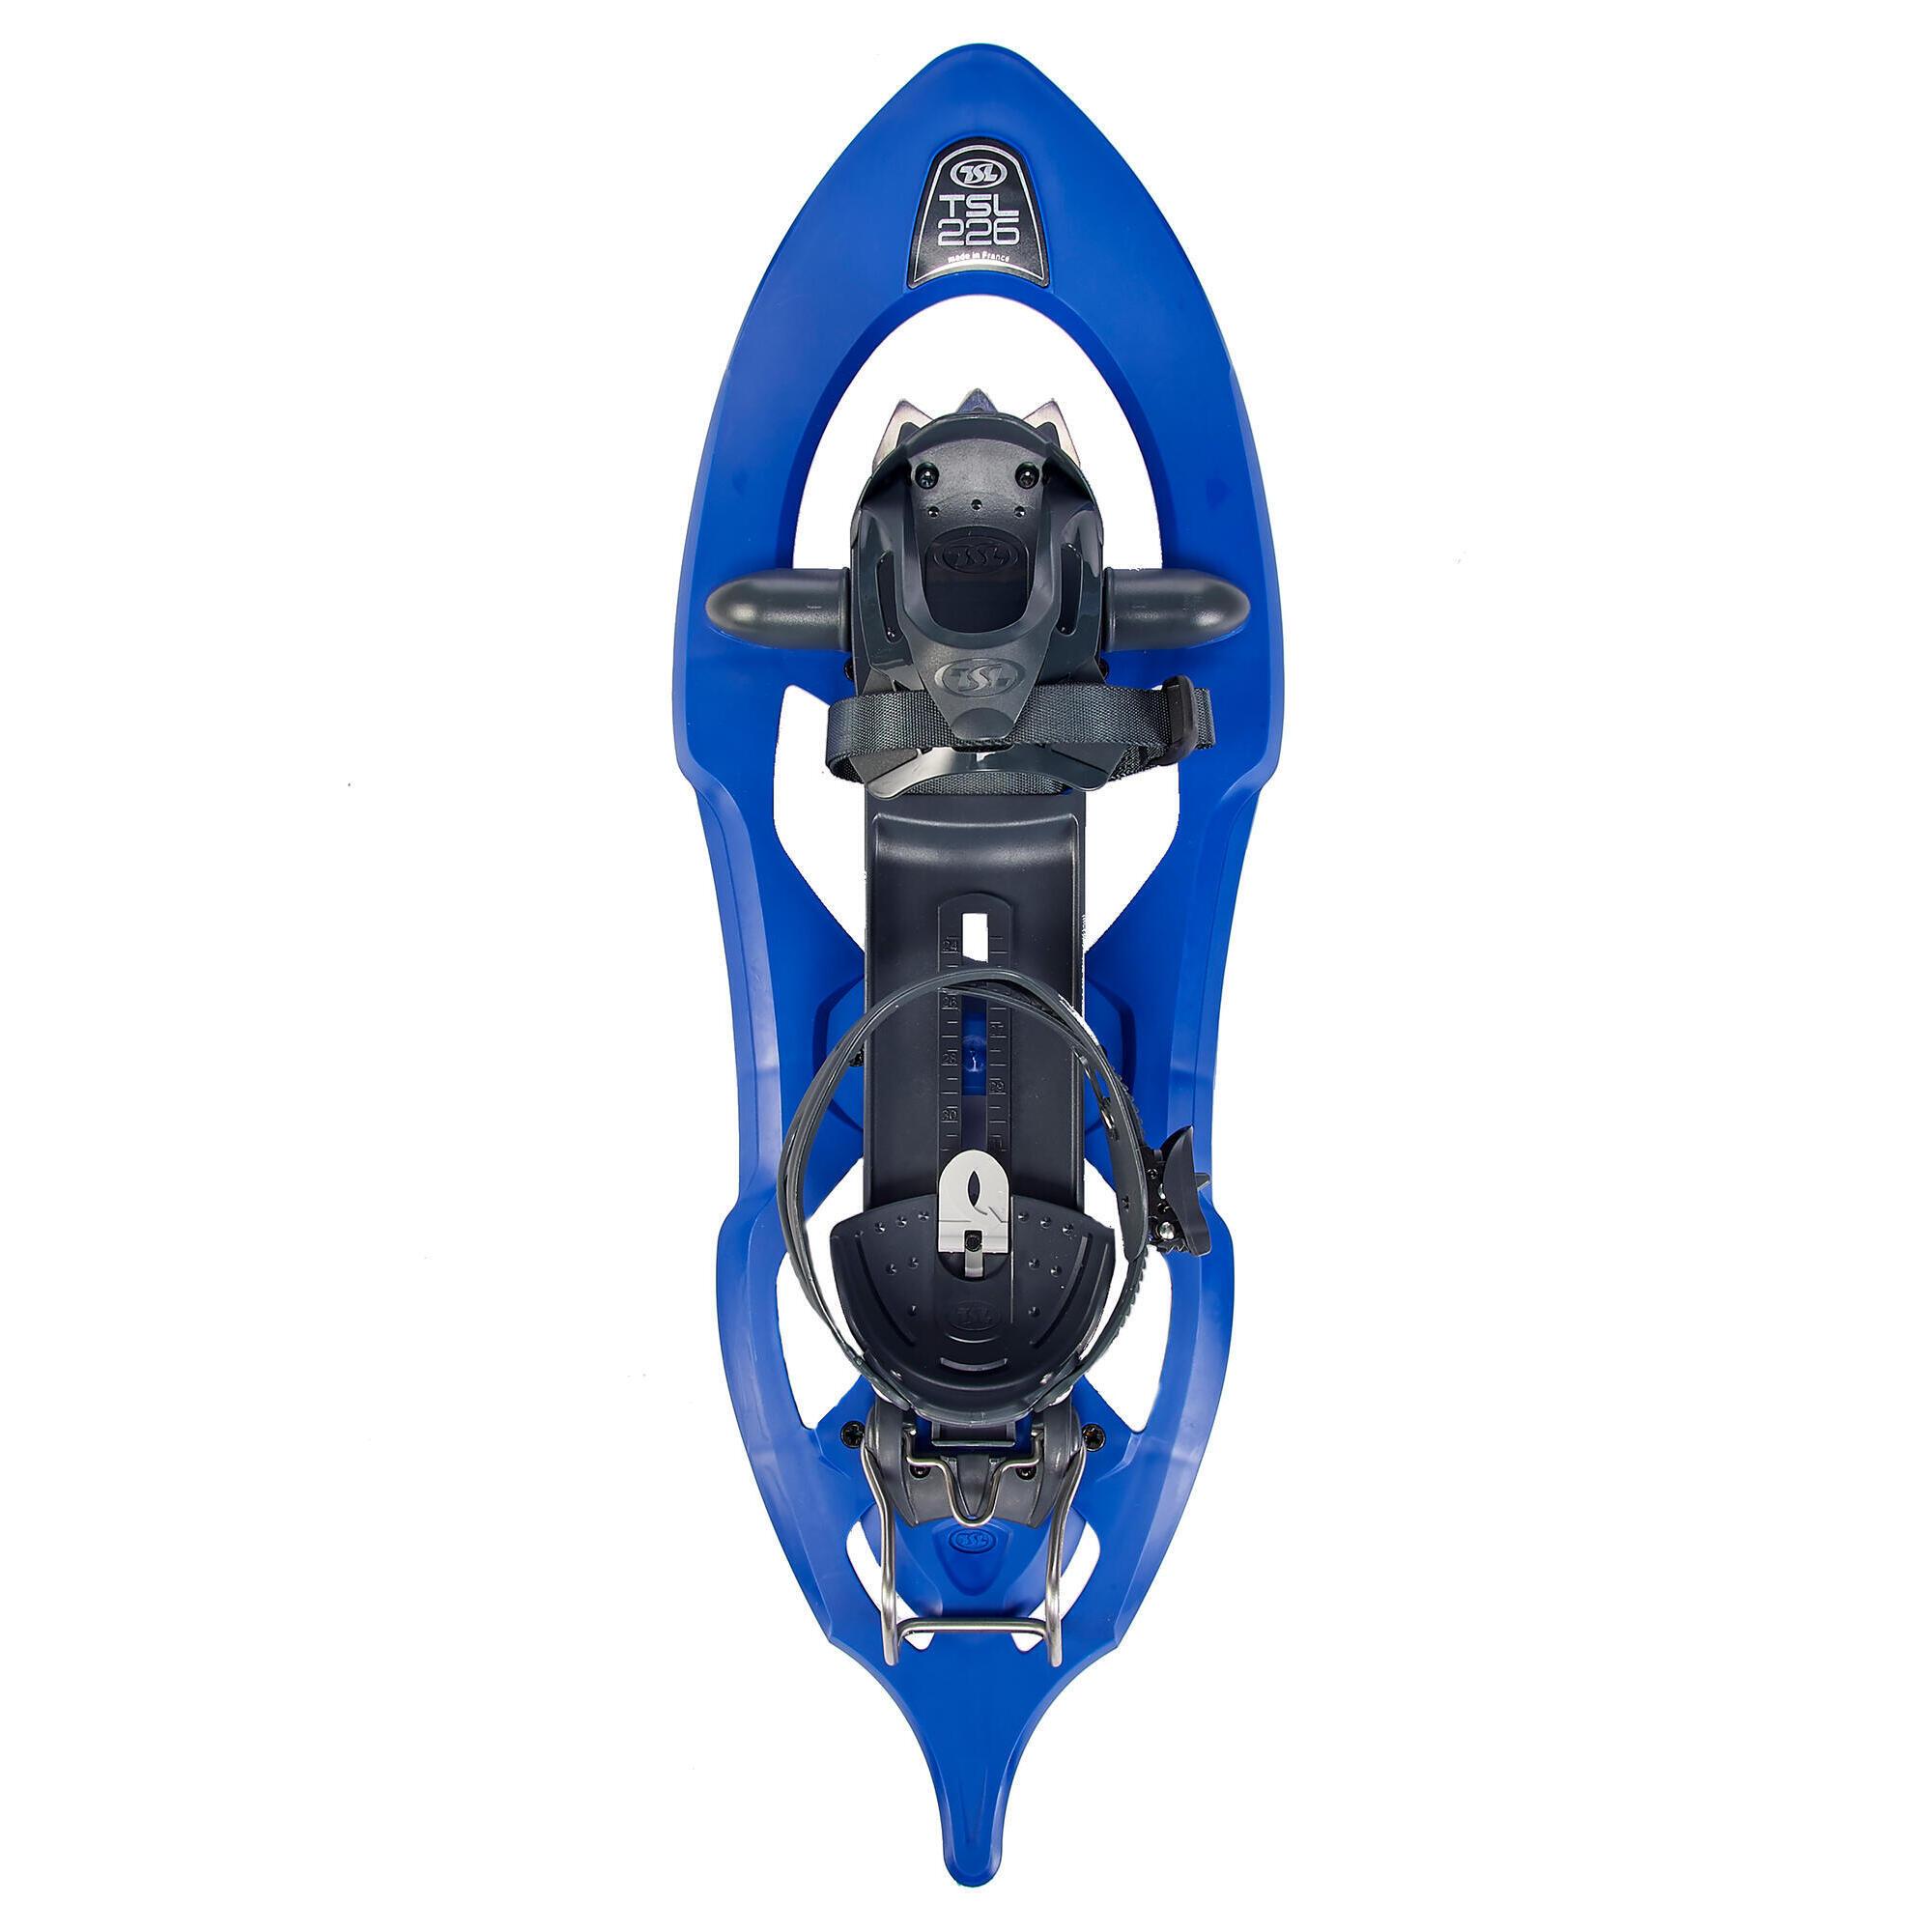 Schneeschuhe TSL 226 EVO großer Rahmen blau | Schuhe > Sportschuhe > Schneeschuhe | Tsl